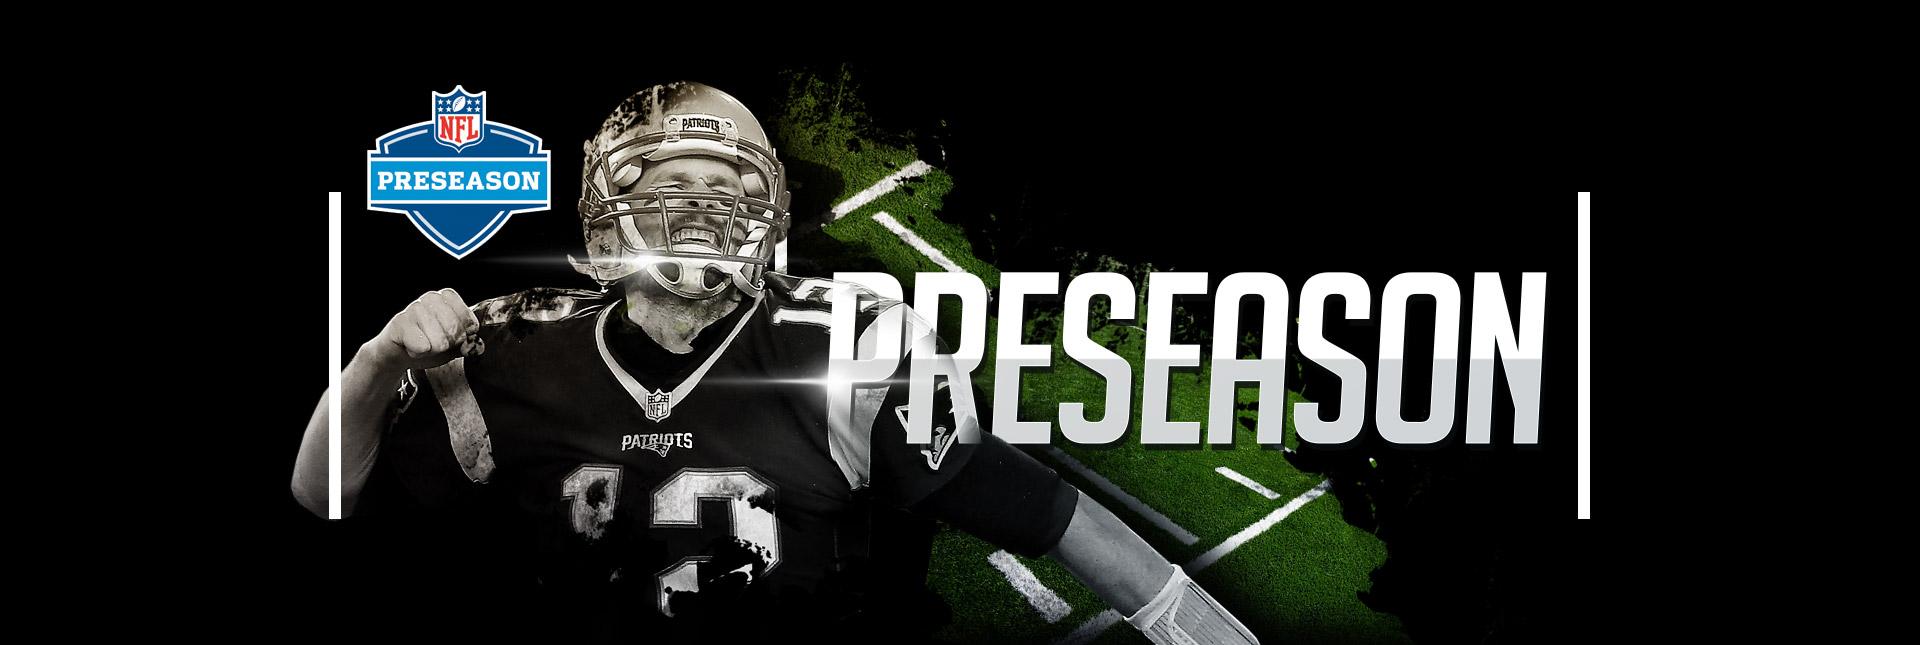 NFL Preseason 2017